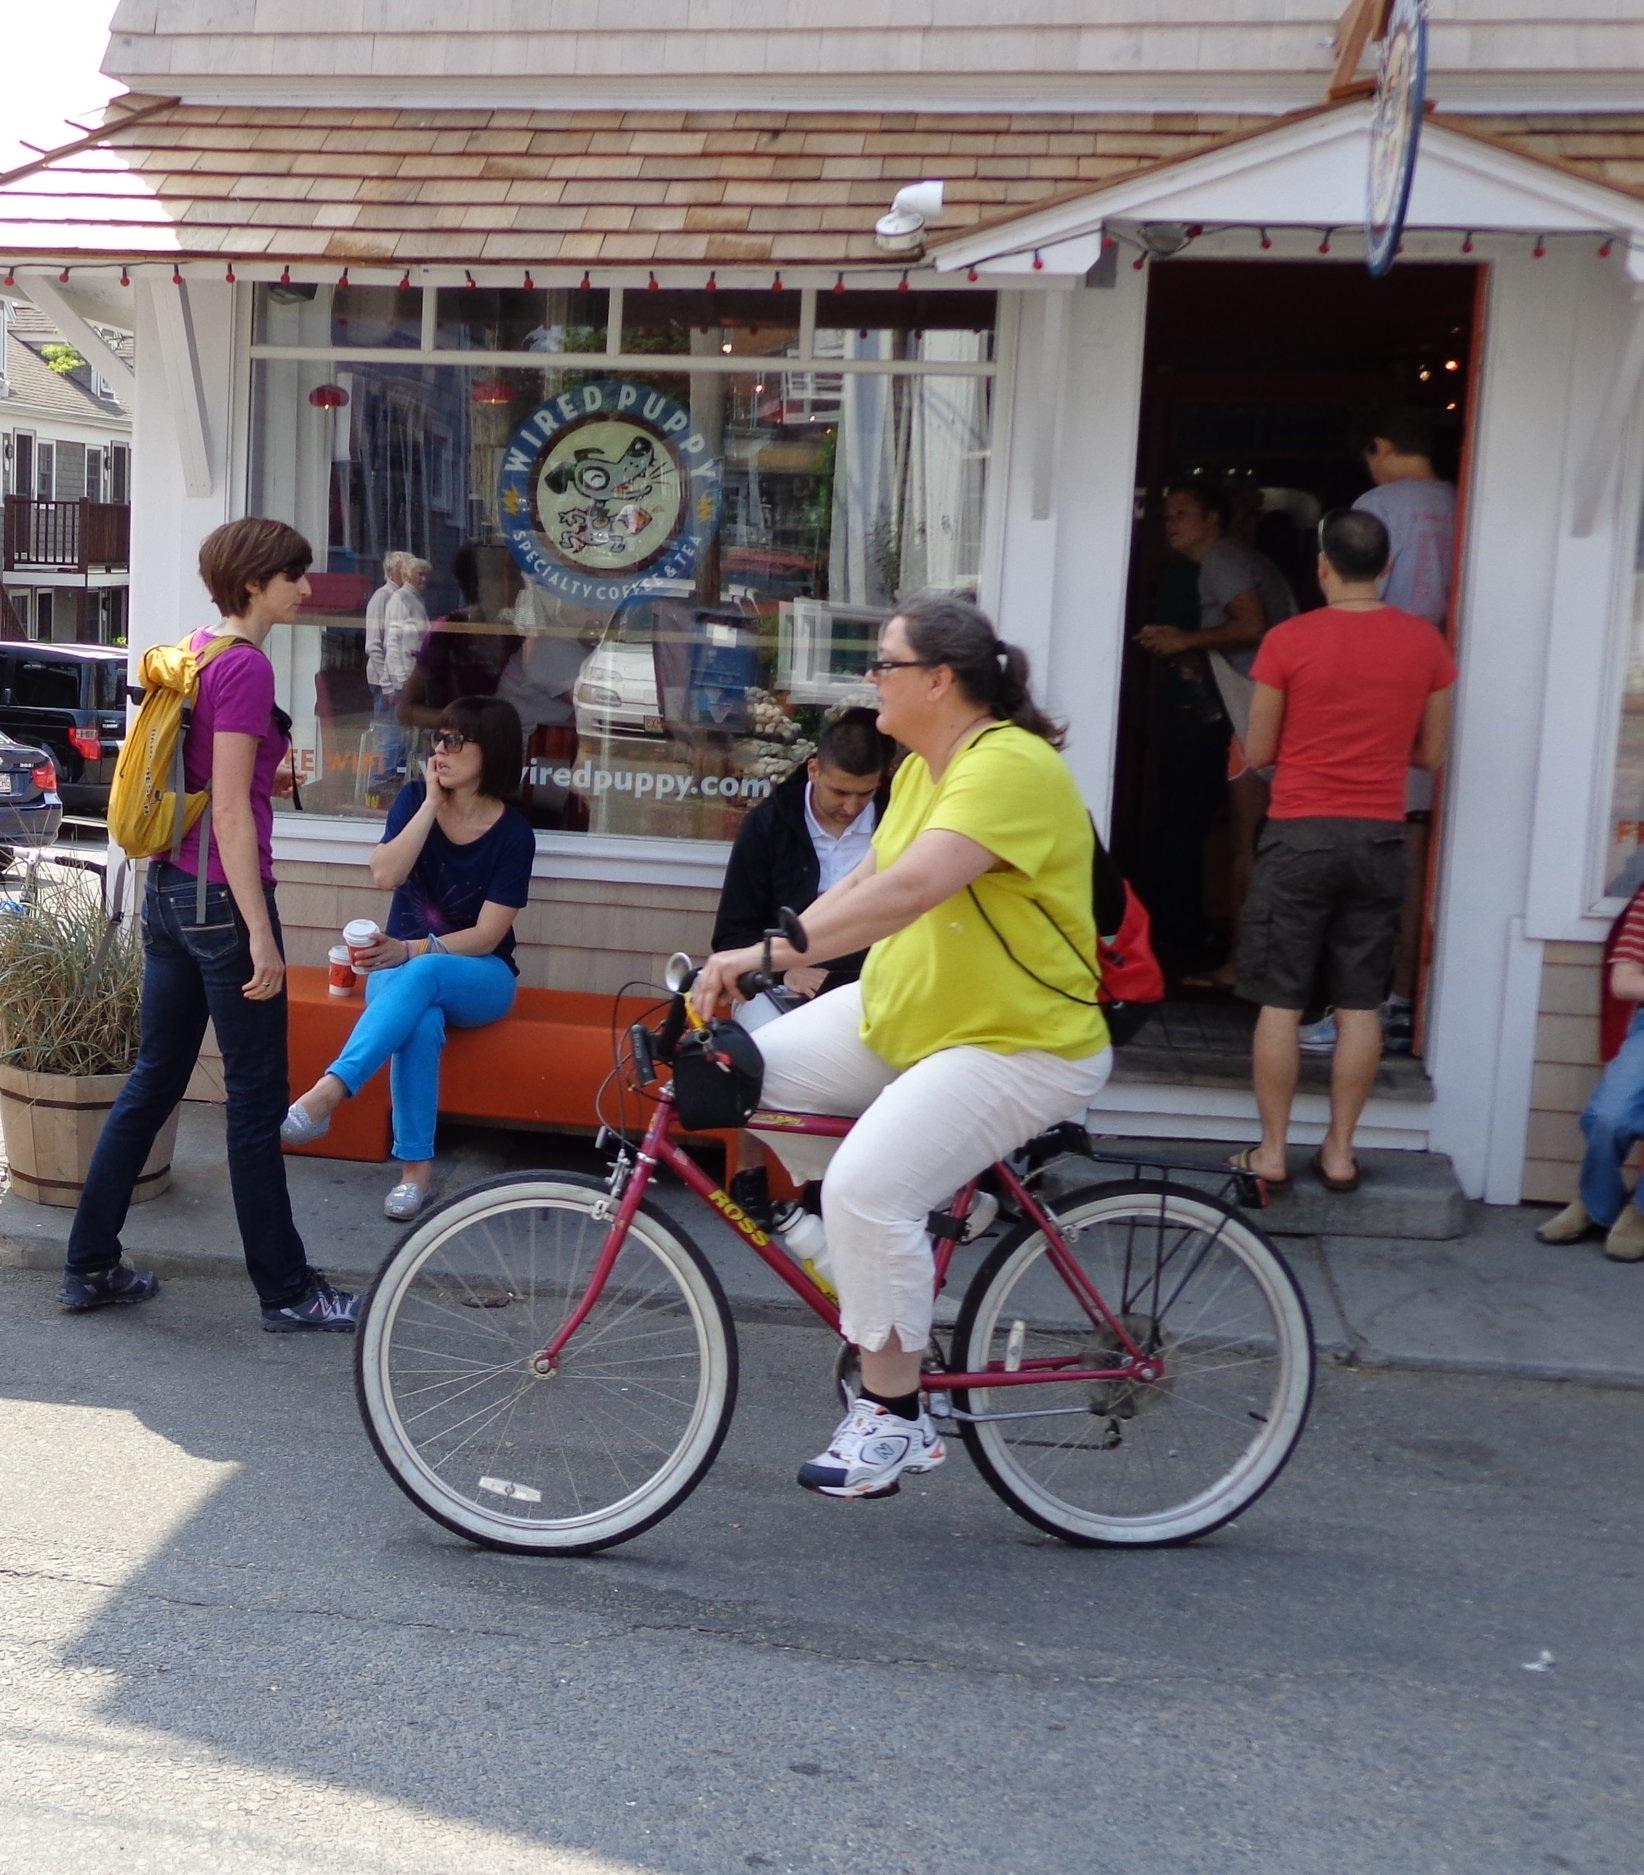 Running, Biking, Walking - Healthier means of transportion